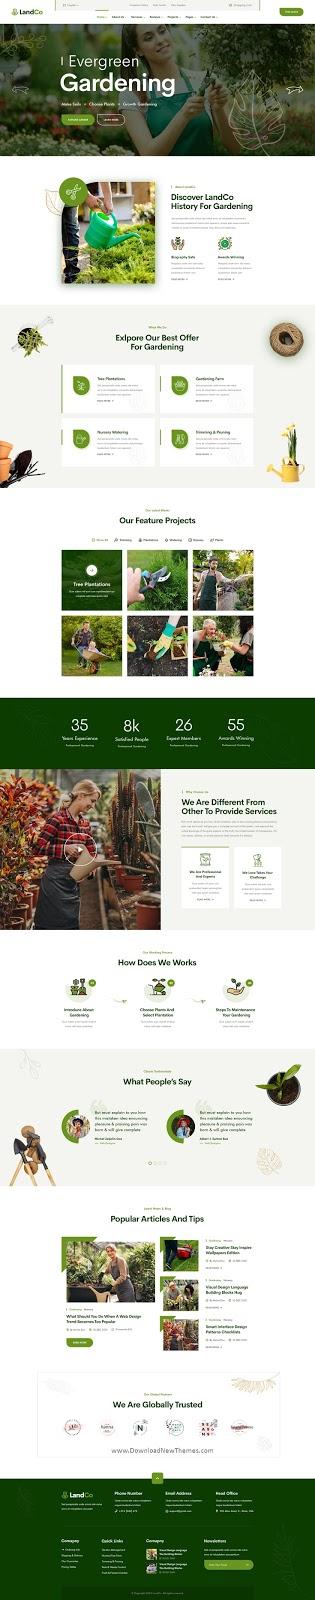 Garden & Landscaping Website Template